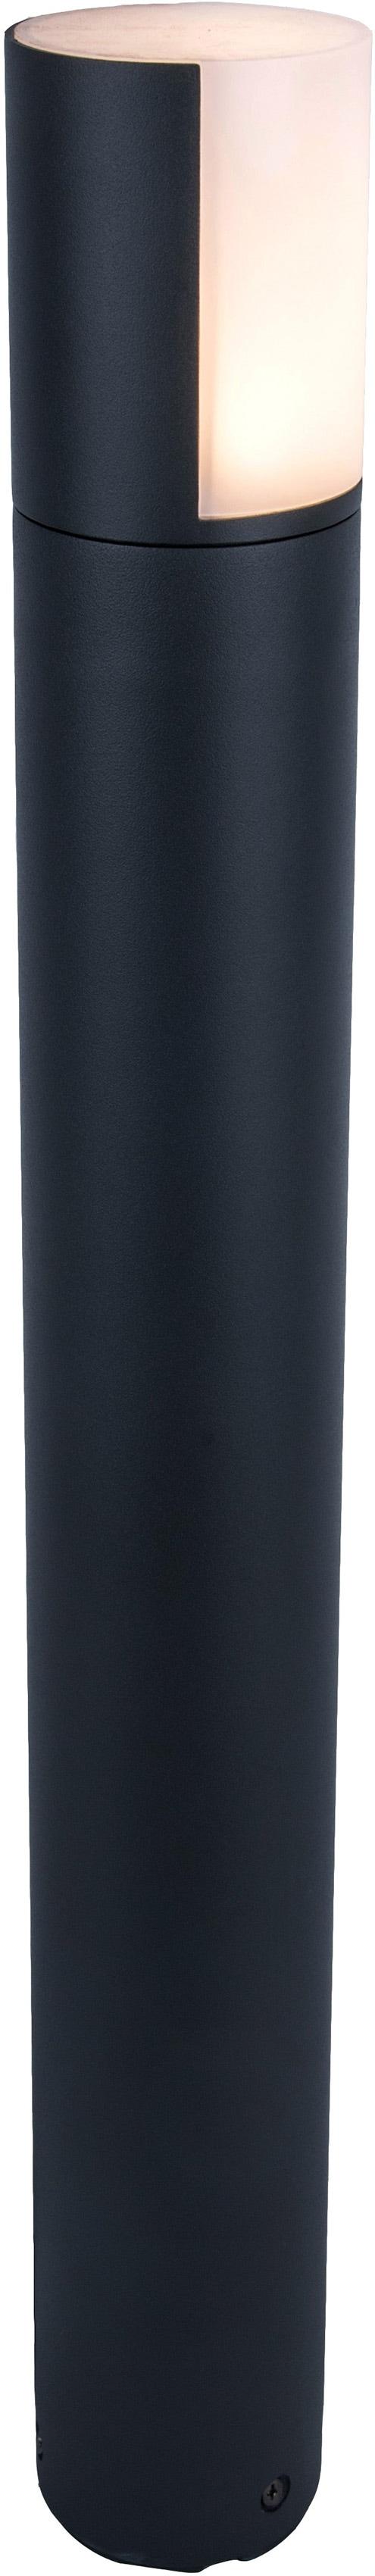 LUTEC LED Außen-Wandleuchte CYRA 7198101012, LED-Modul, 1 St., Warmweiß